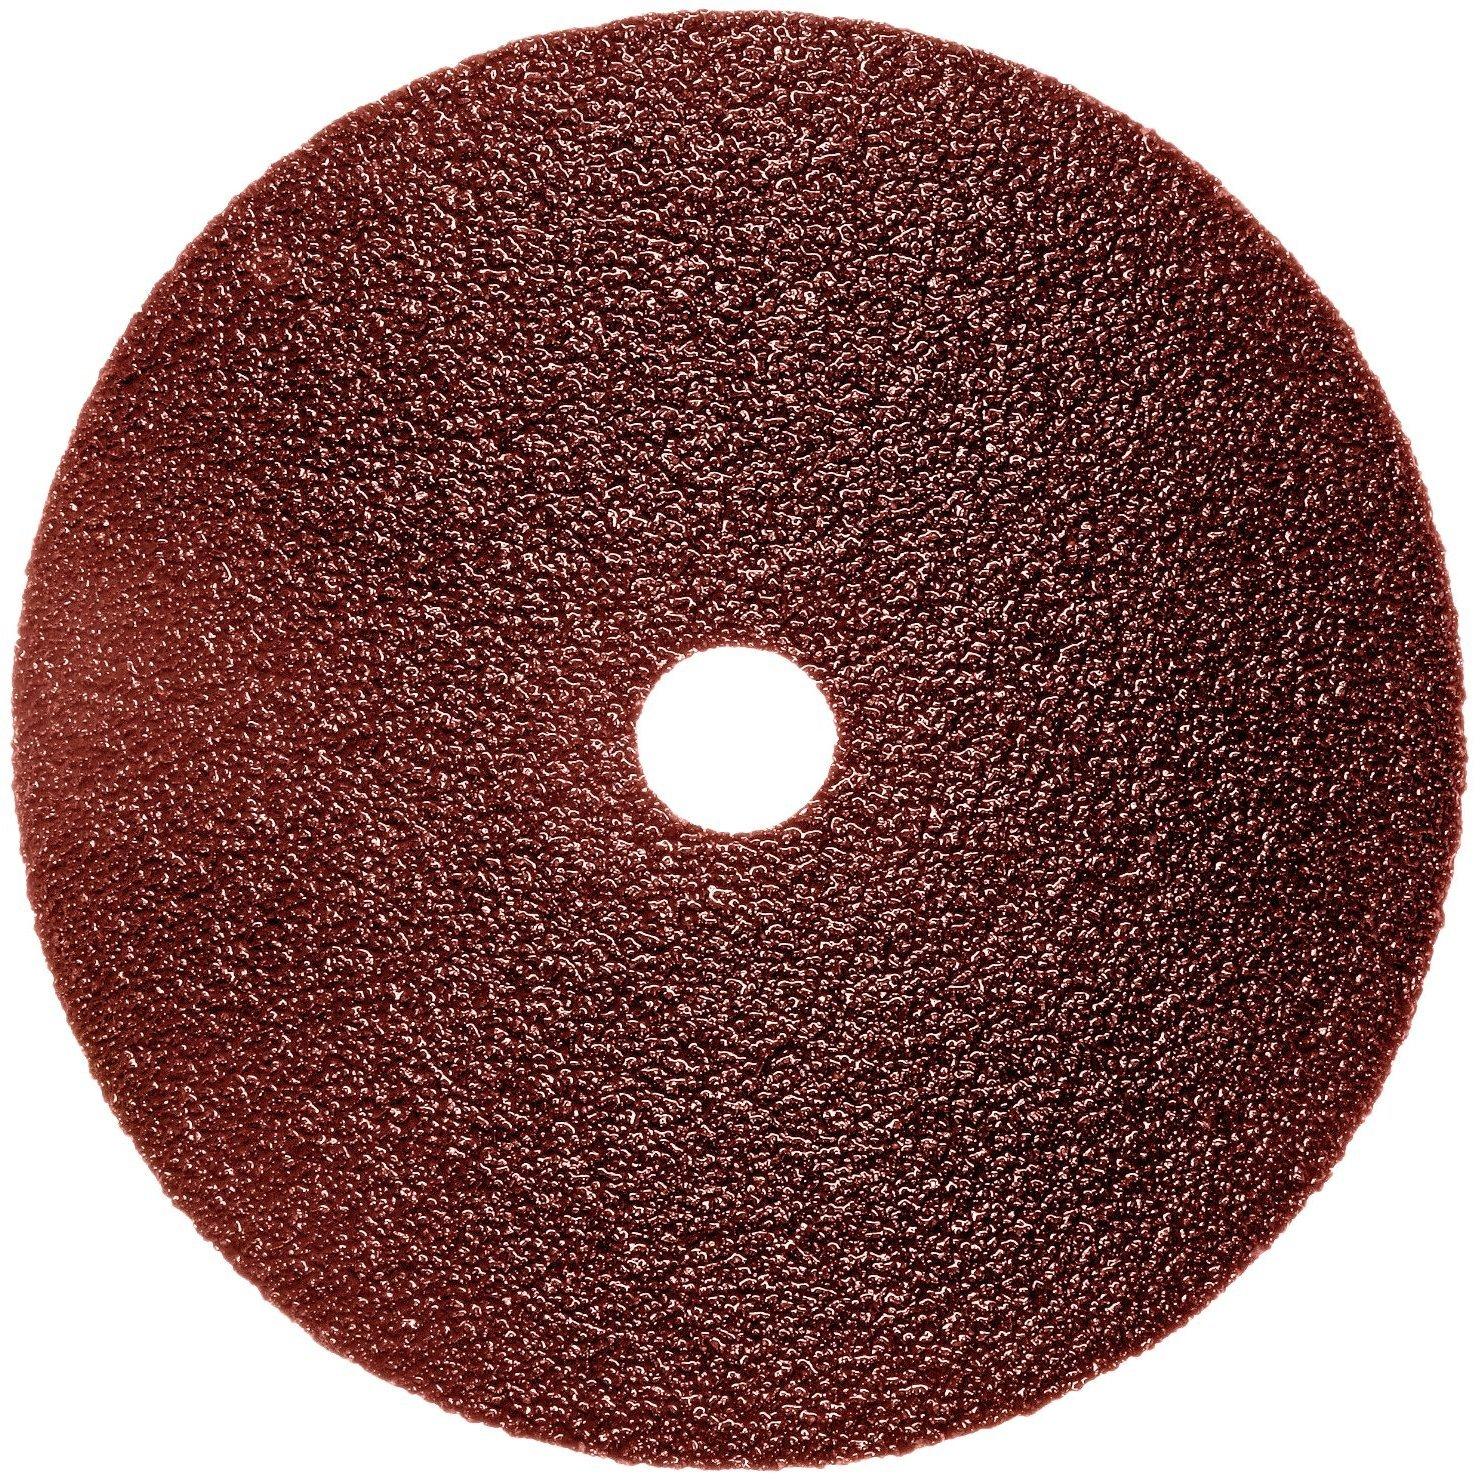 B001HBUM5O 3M Fibre Disc 381C, 24, 5 in x 7/8 in, Die 500P 91ajCF05rEL